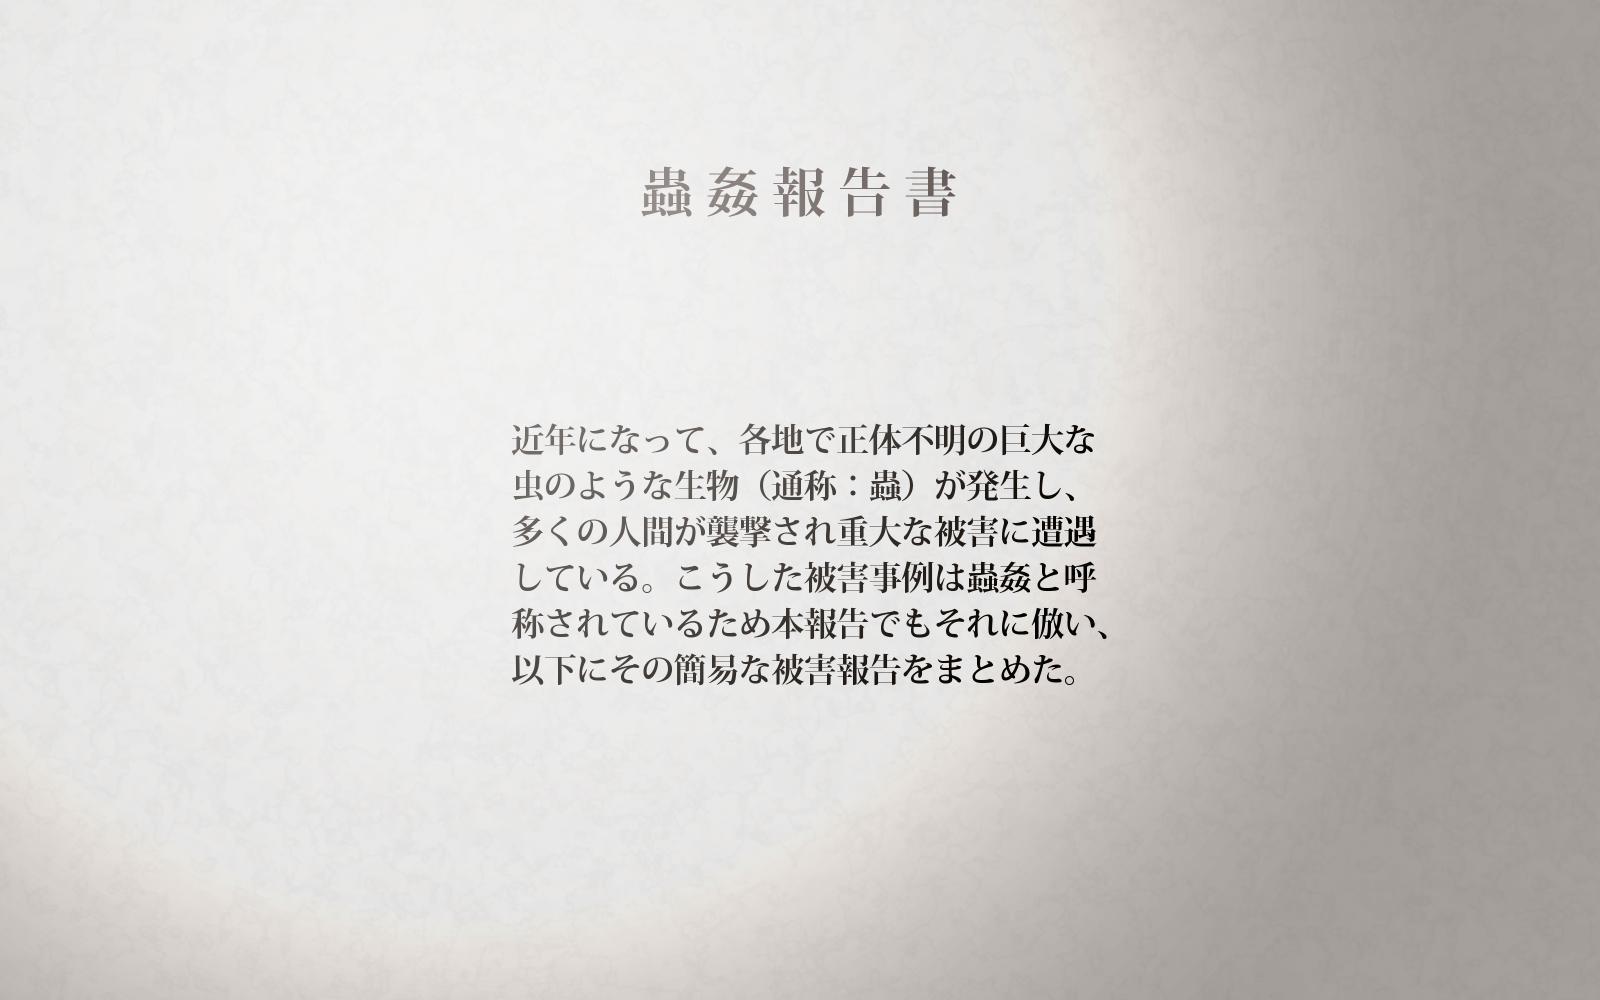 Chuukan Houkokusho 19